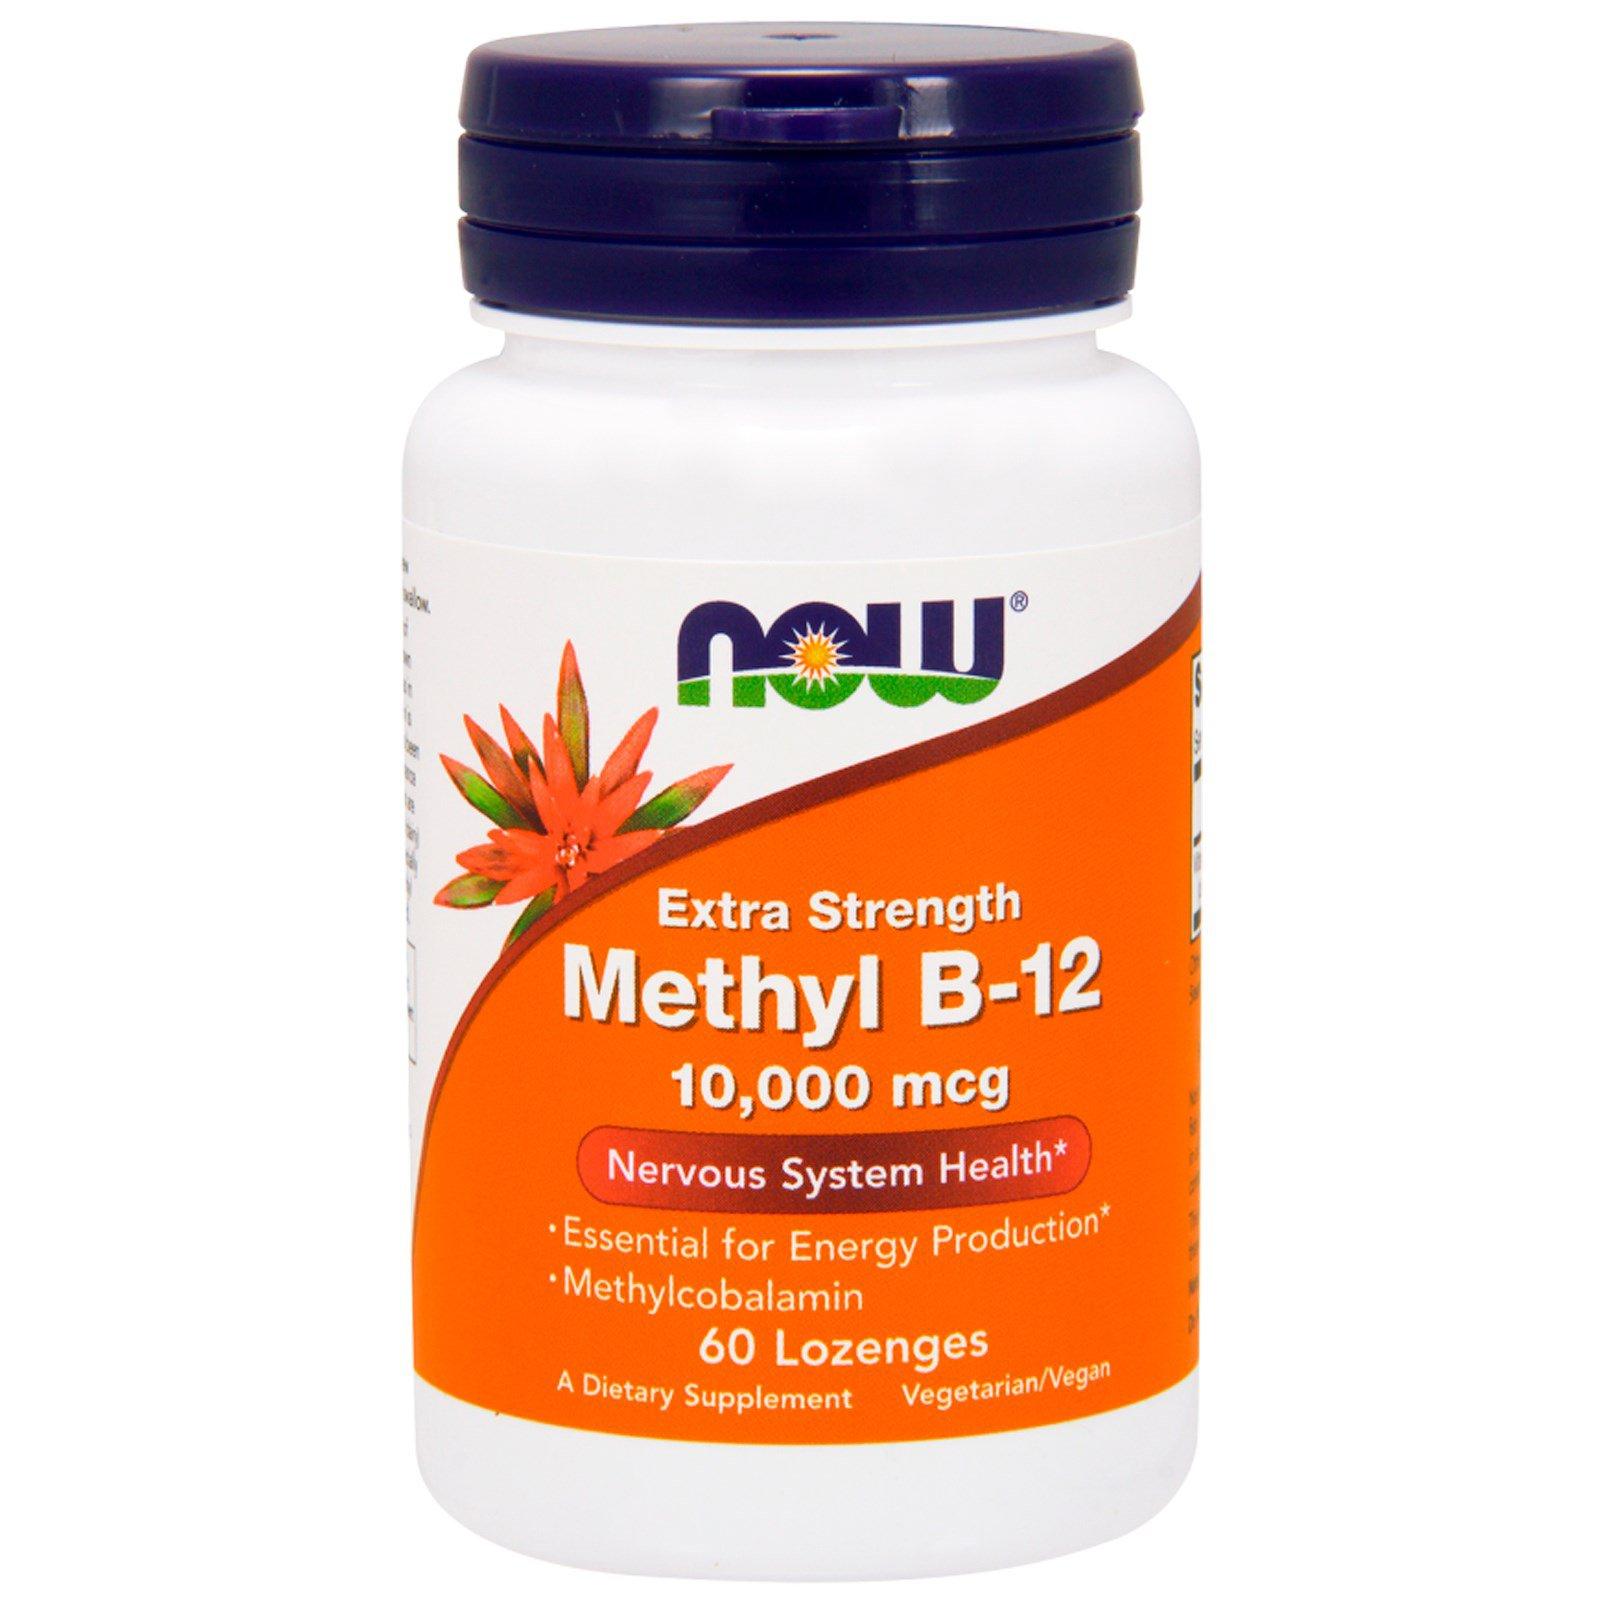 Image of Methyl B-12 Extra Strength 10.000 mcg (60 lozenges) - Now Foods 0733739005014